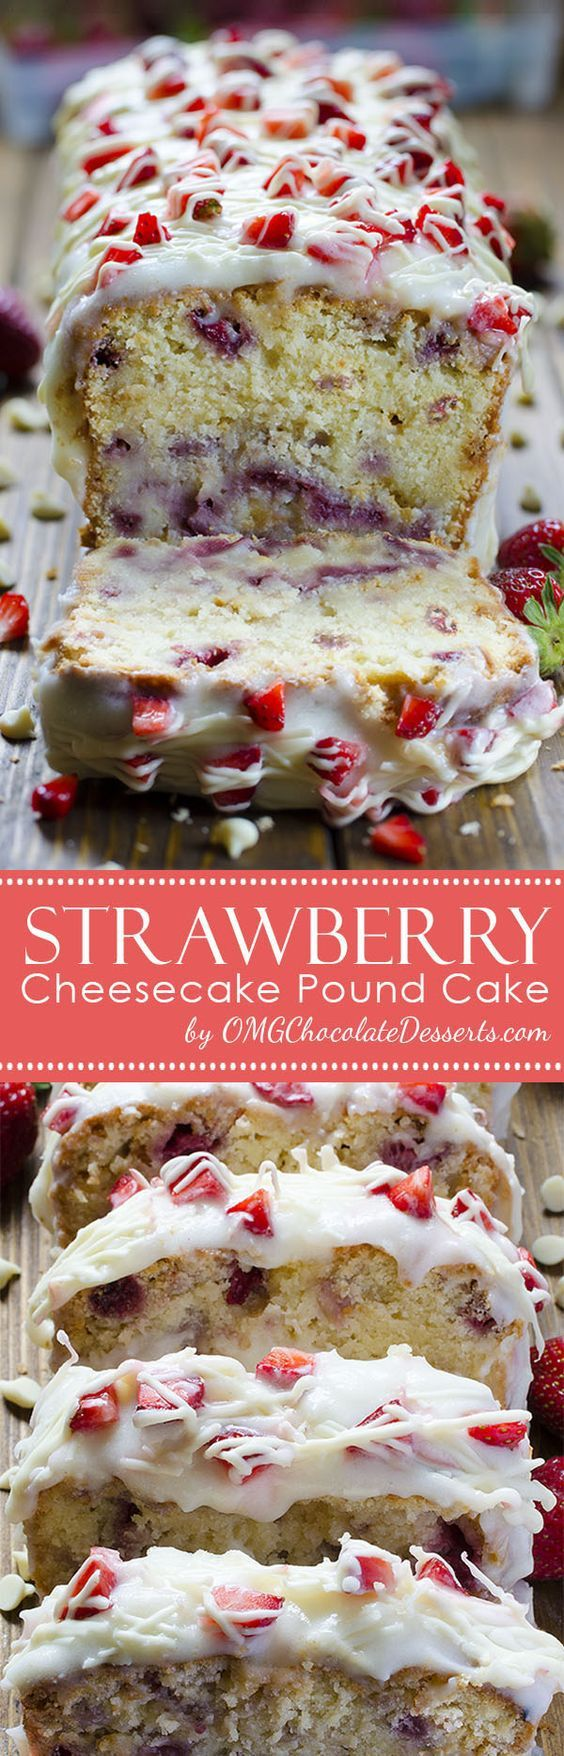 Strawberry Cheesecake Pound Cake Recipe via OMG Chocolate Desserts - Start your spring dessert season with fresh strawberry and delicious pound cake